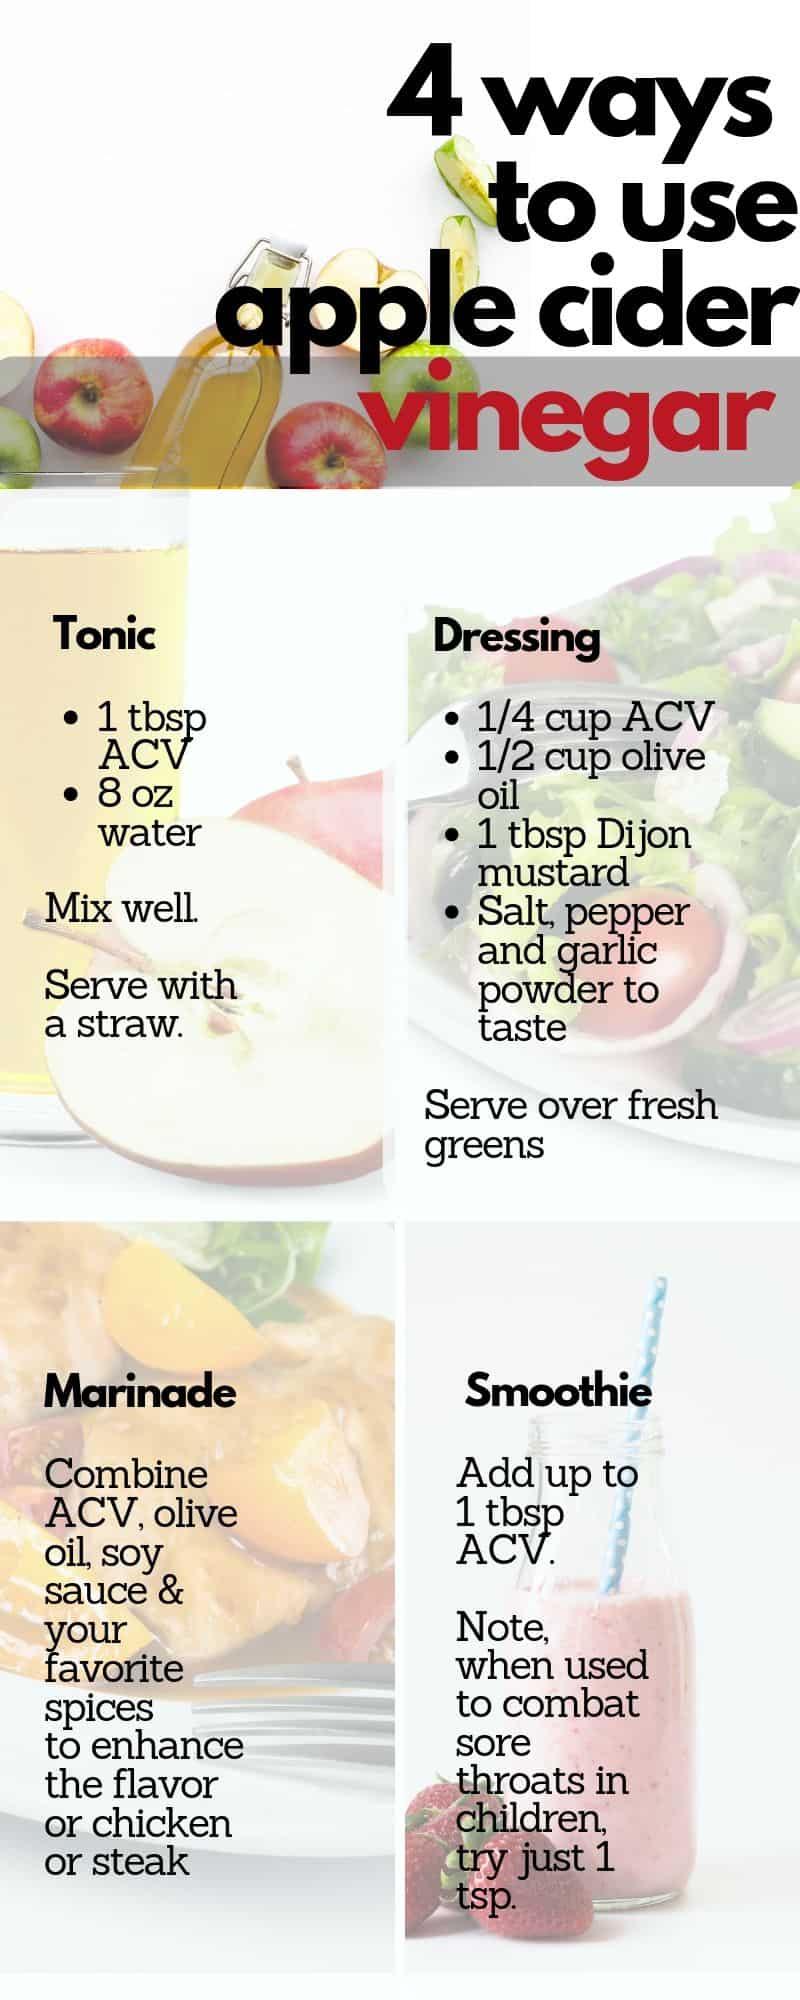 4 ways to use apple cider vinegar